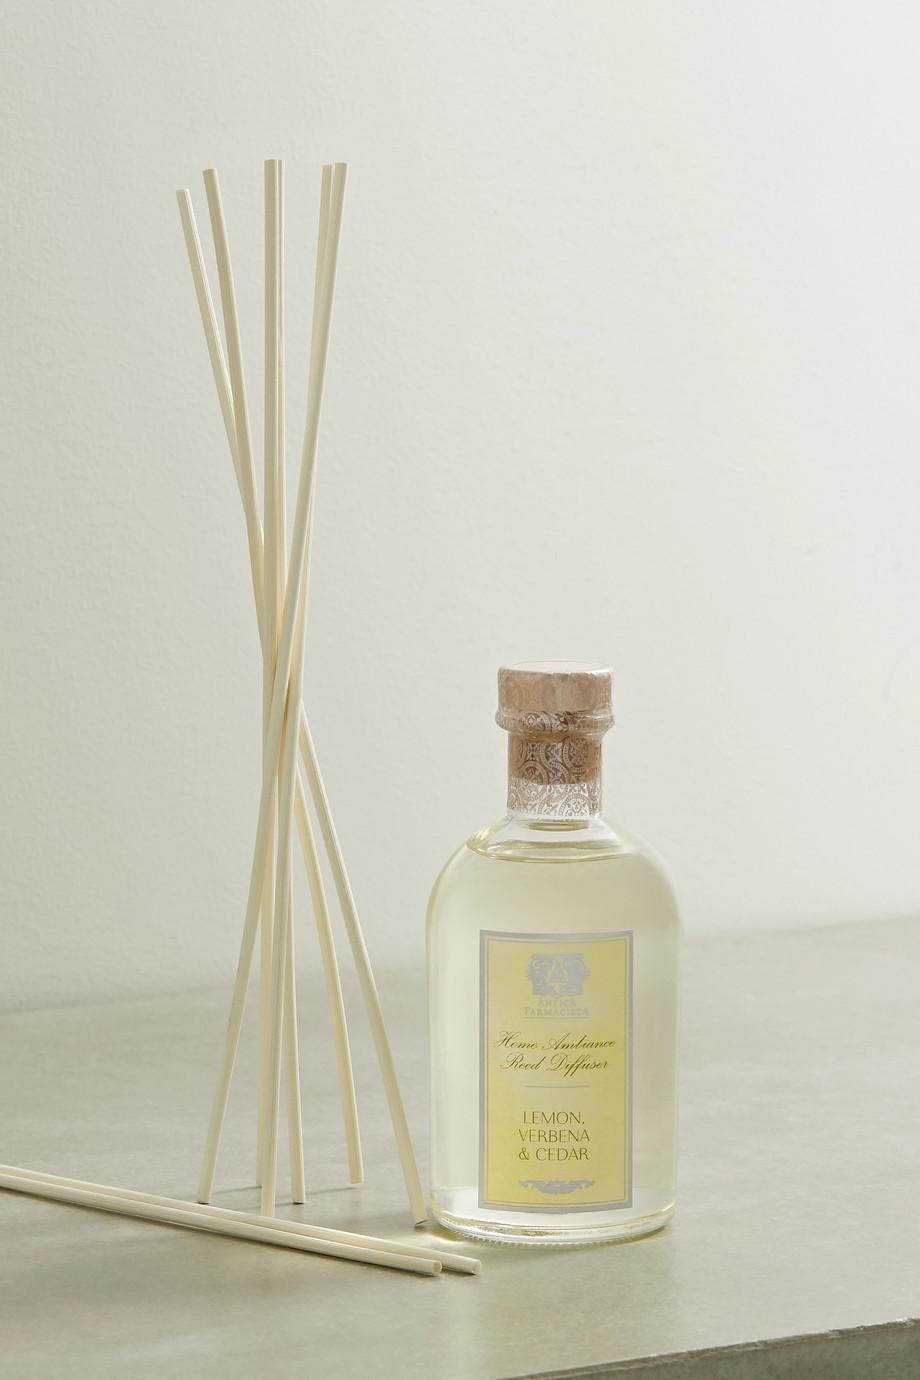 Antica Farmacista Lemon, Verbena & Cedar Reed Diffuser, 250 ml – Raumduft